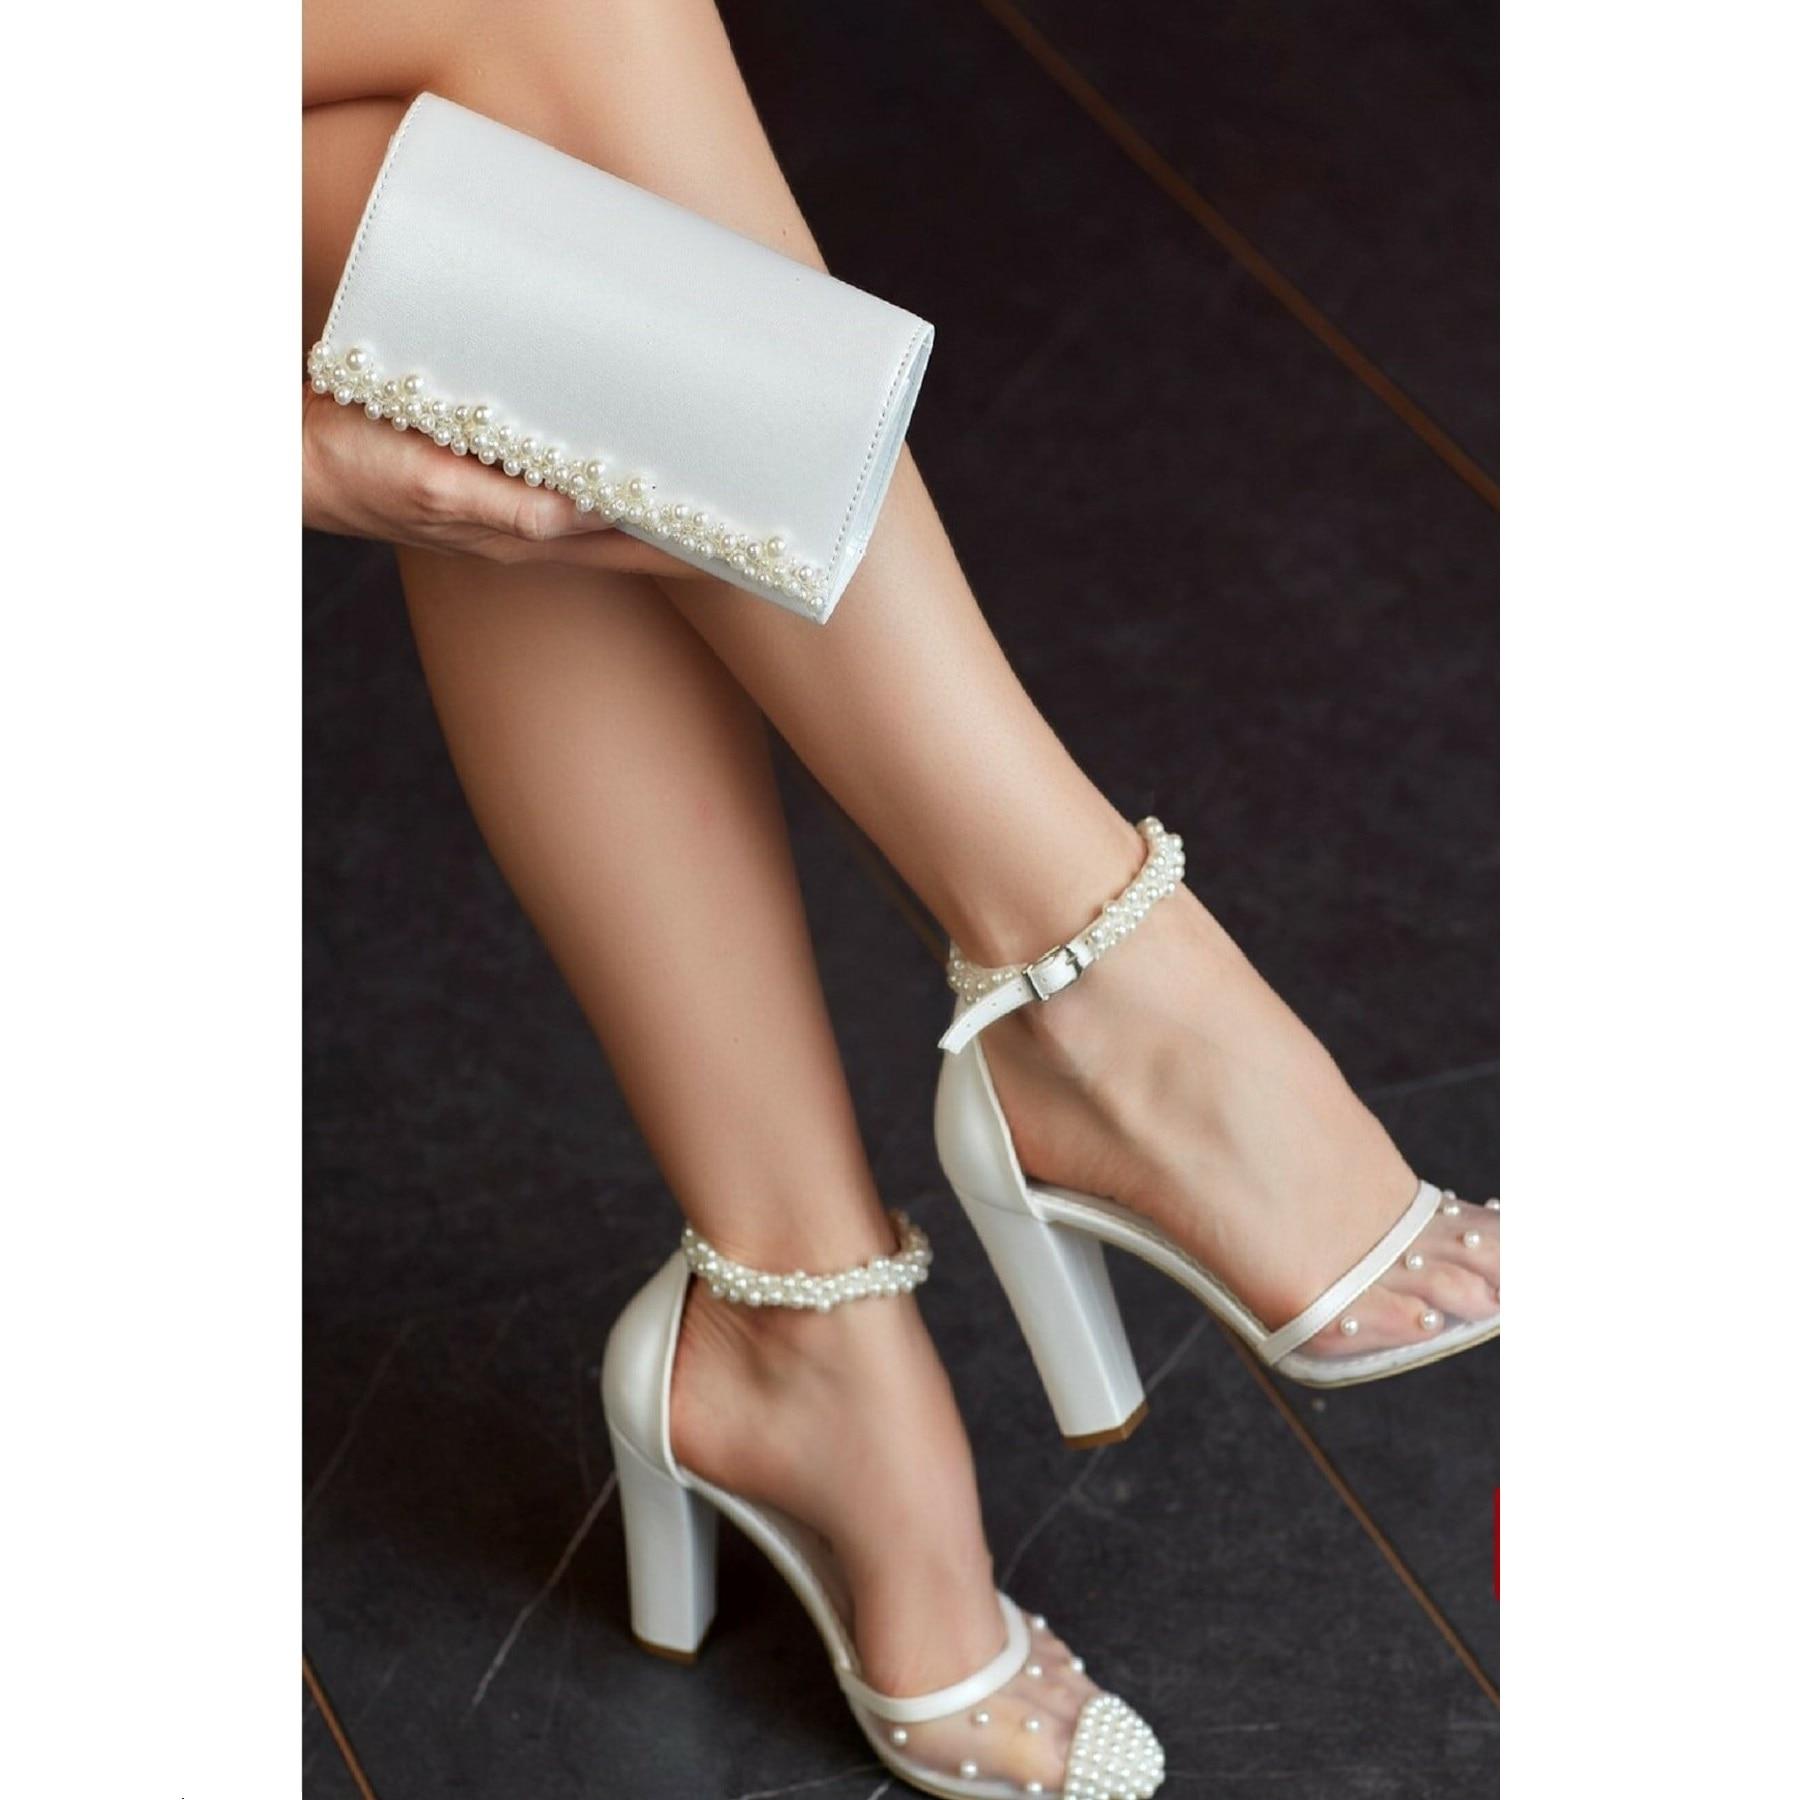 Women's High-Heeled Shoes Bag Set Party Invitation Wedding Dress Shoes Gift Bag-00